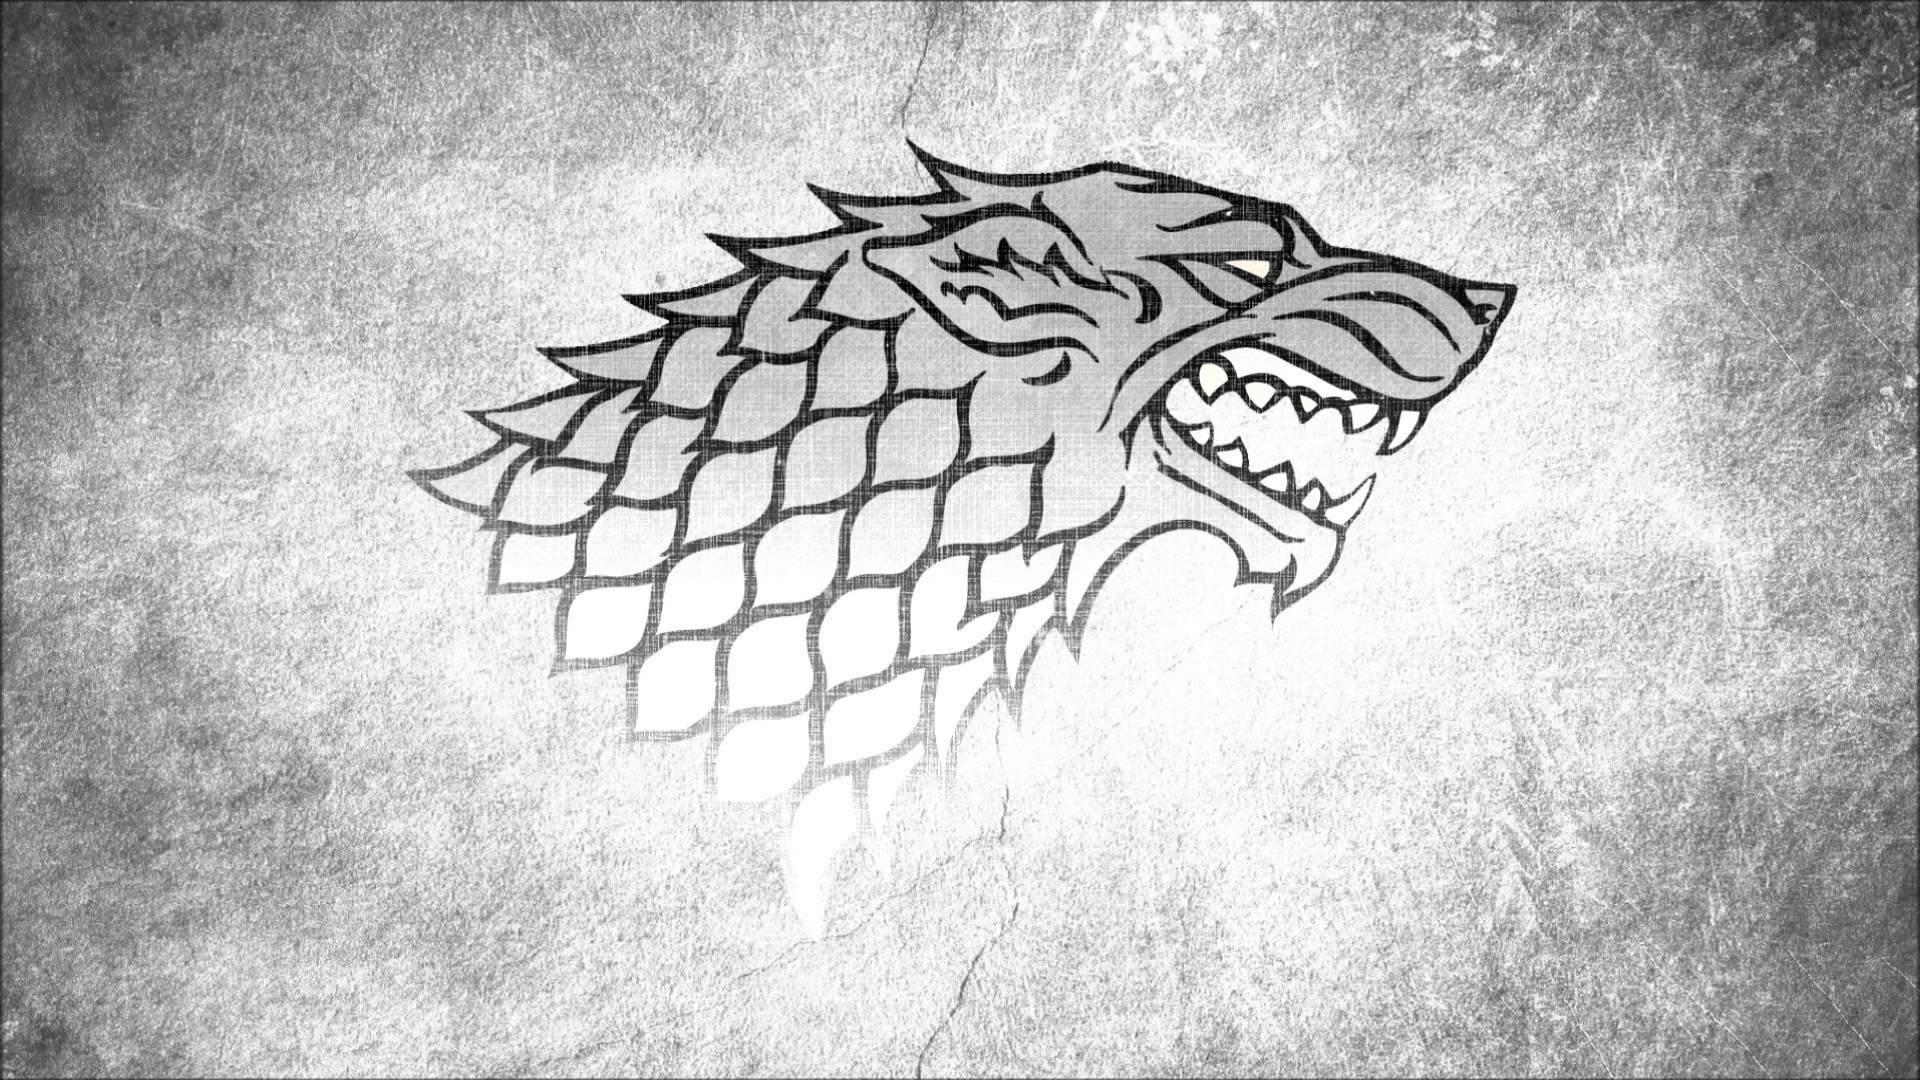 122 Game Of Thrones Wallpaper 1080p